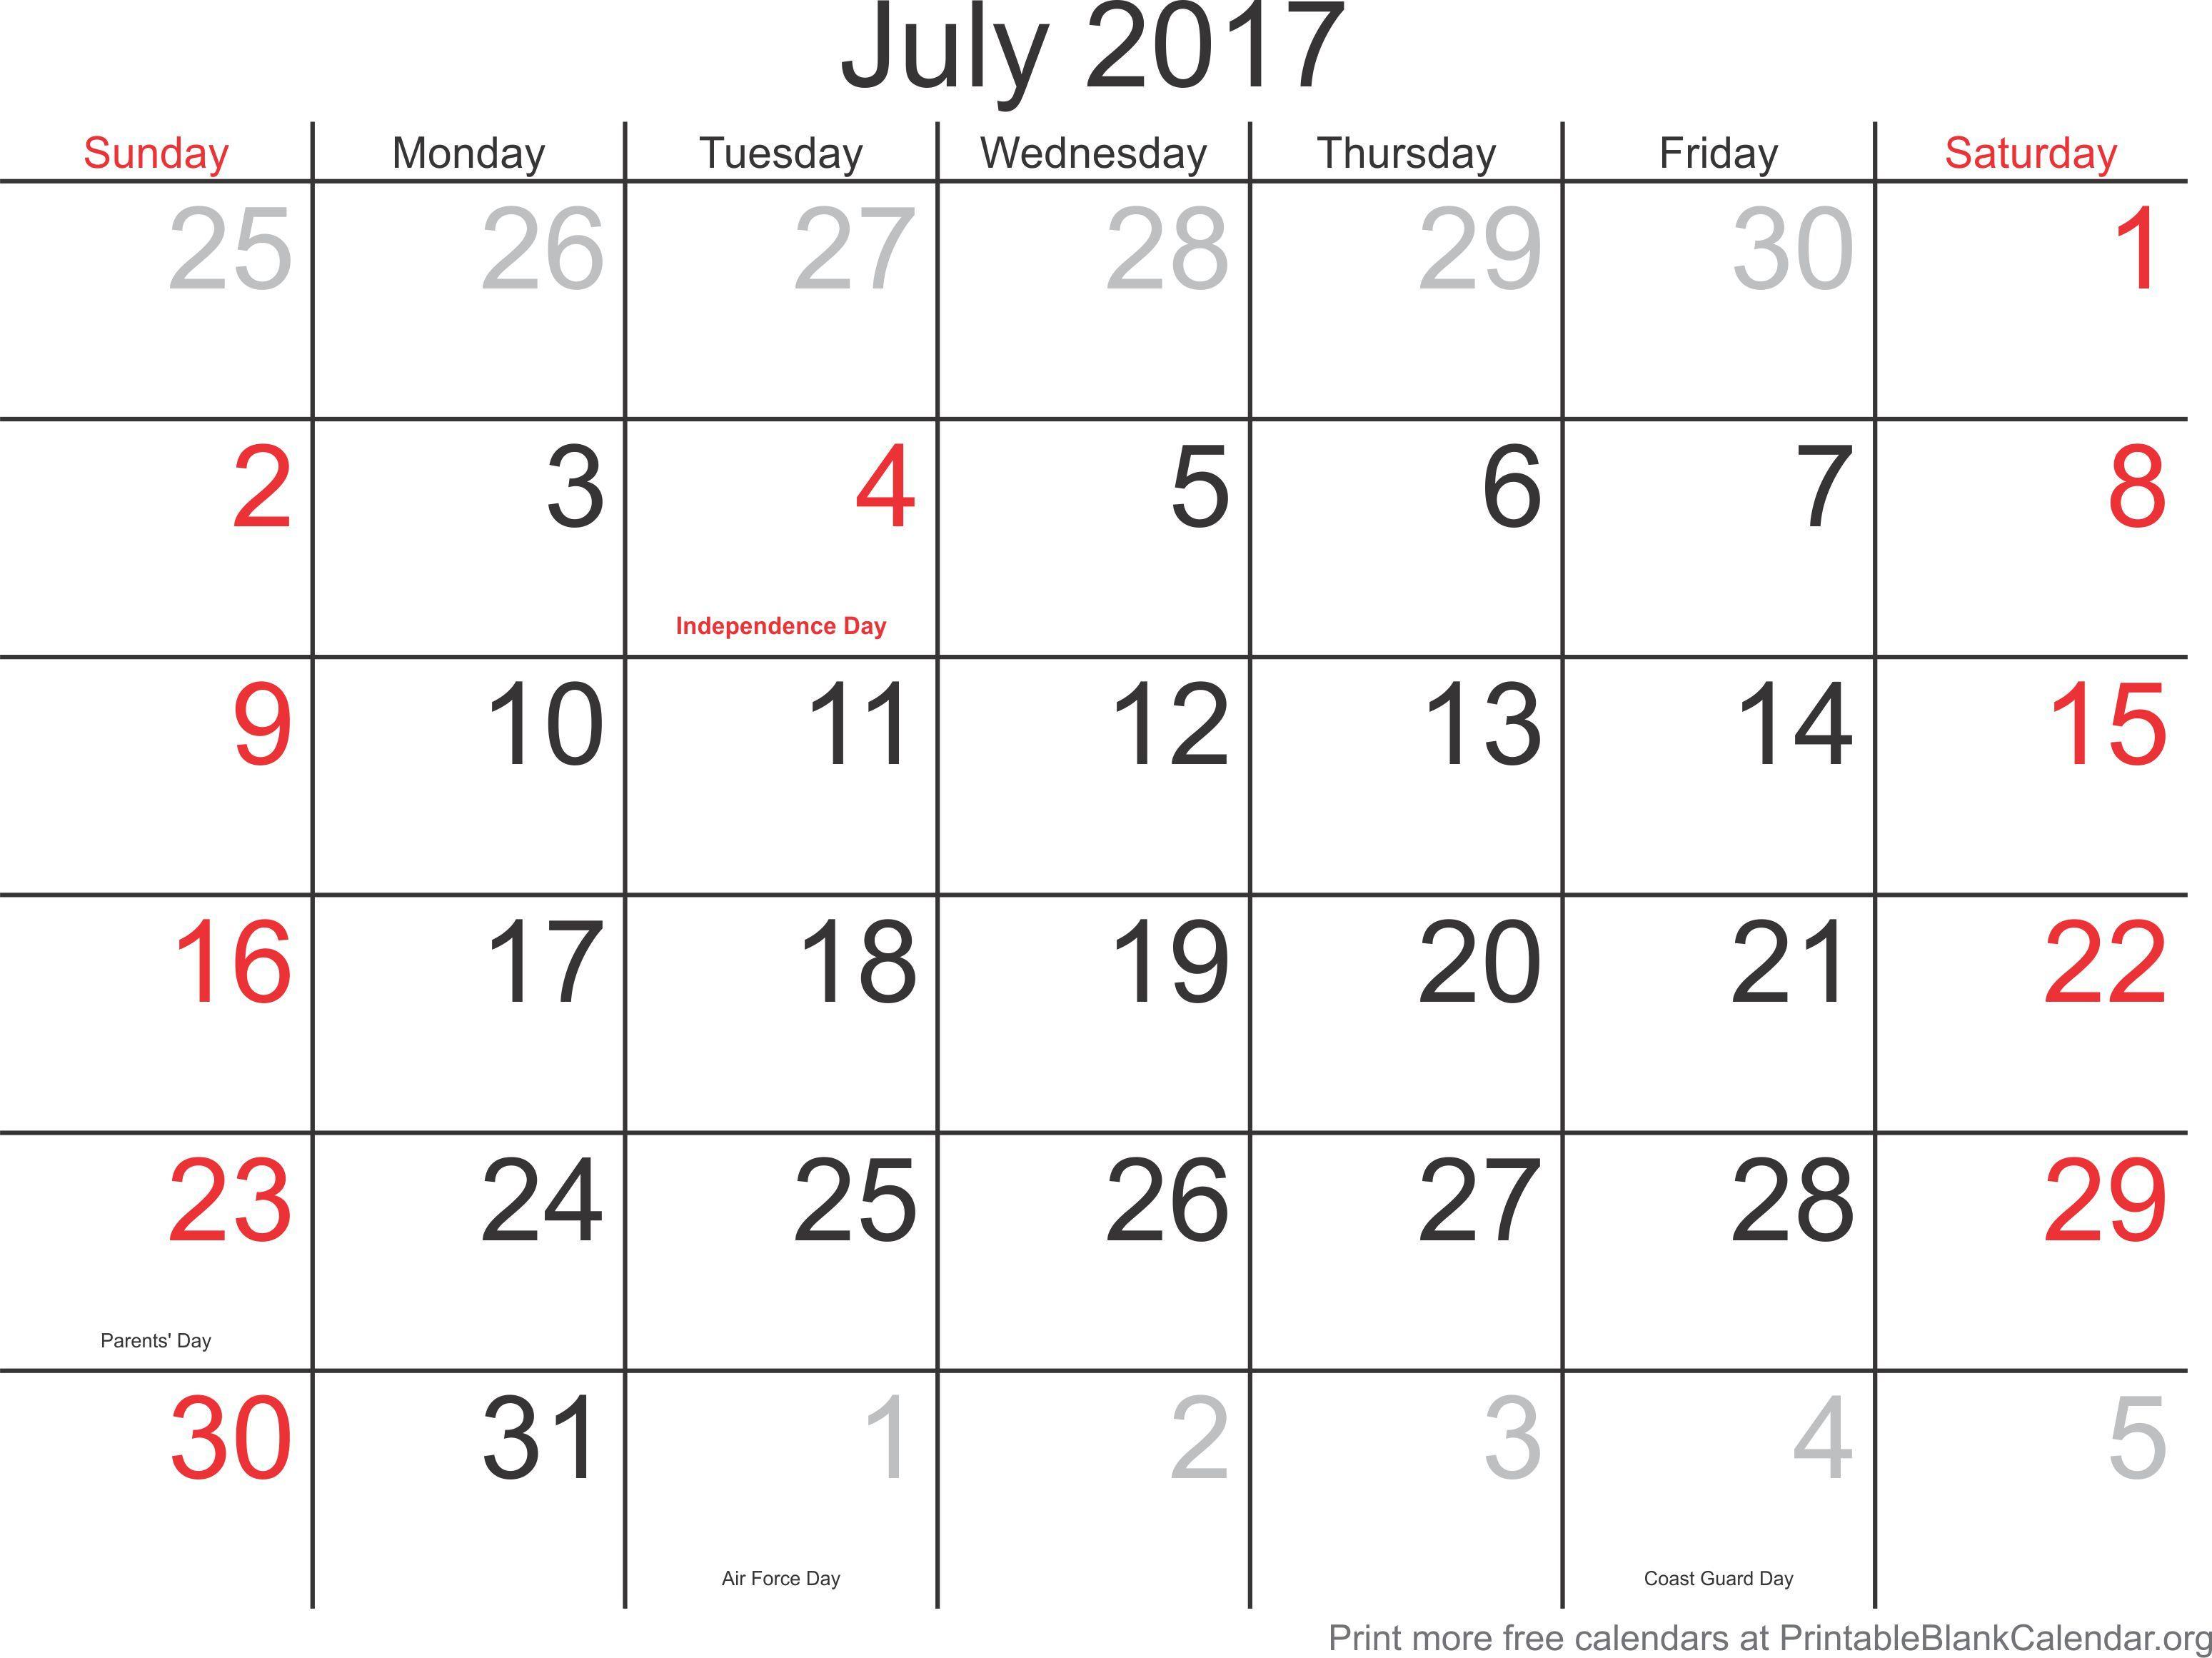 July 2017 Free Printable Blank Calendar - Printable Blank Calendar pertaining to Printable Blank 31 Day Calendar